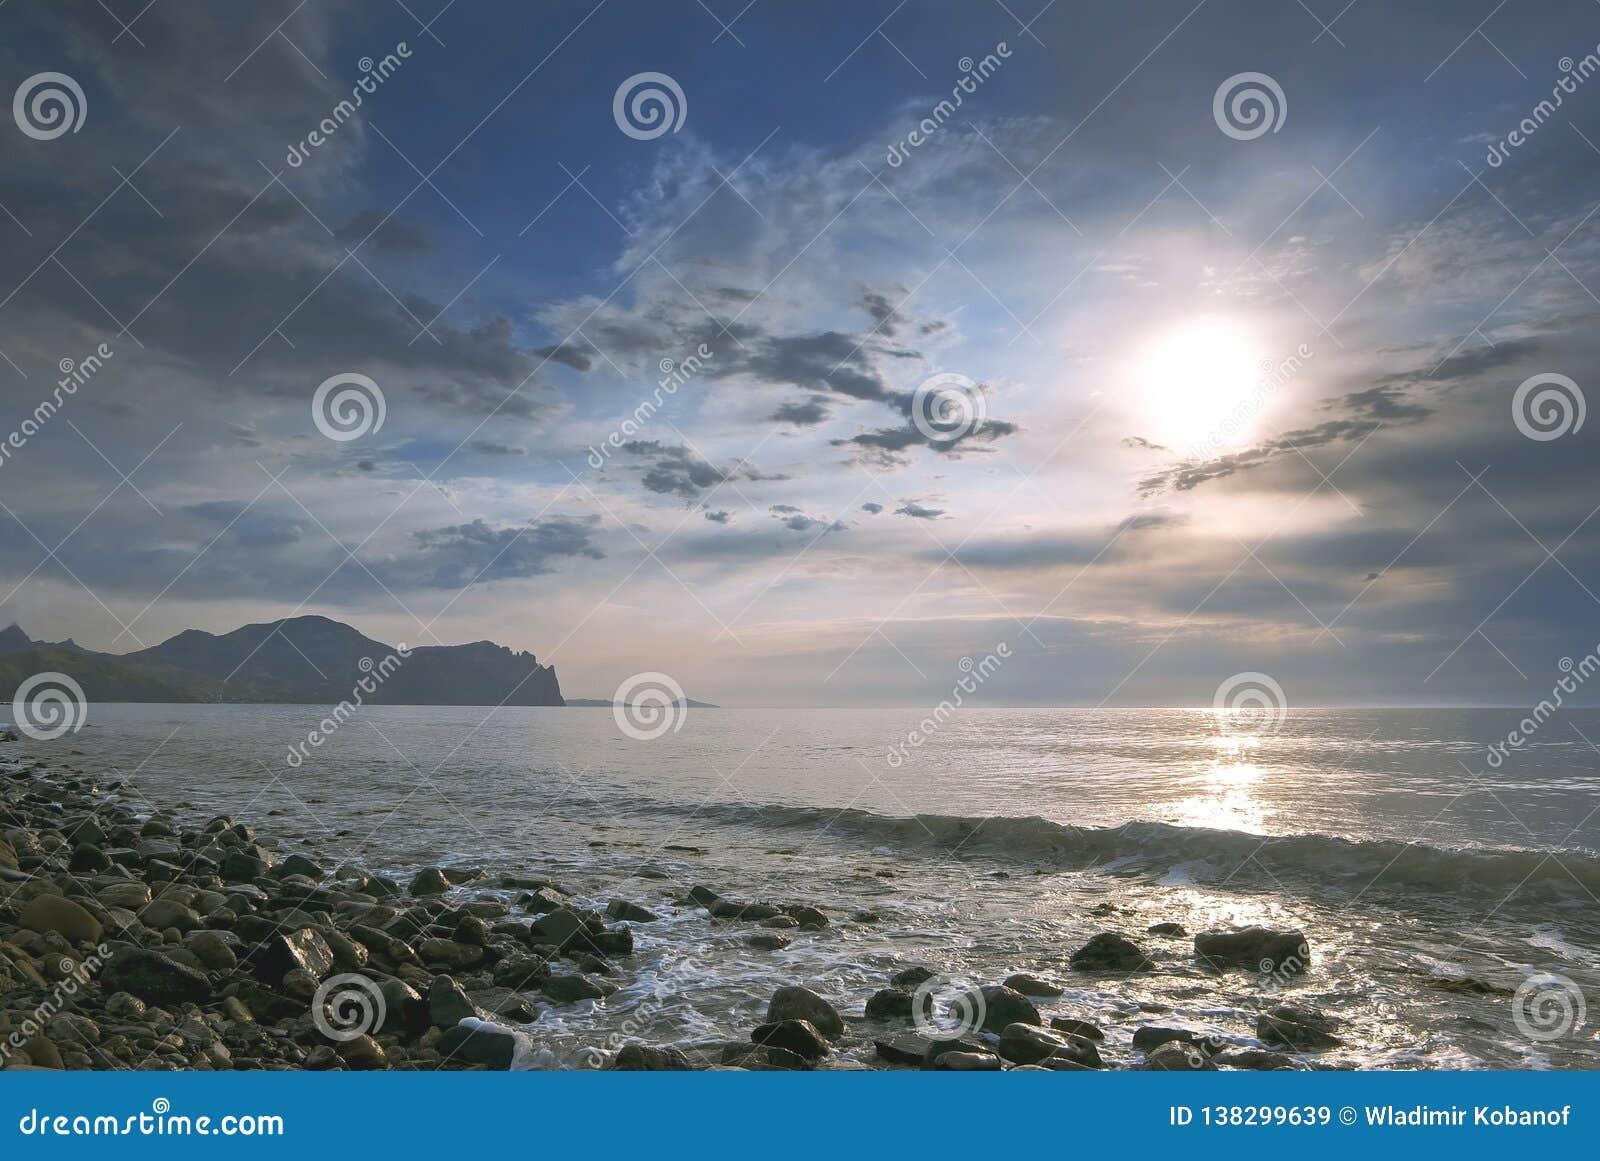 Wschód słońca na spokojnym morzu